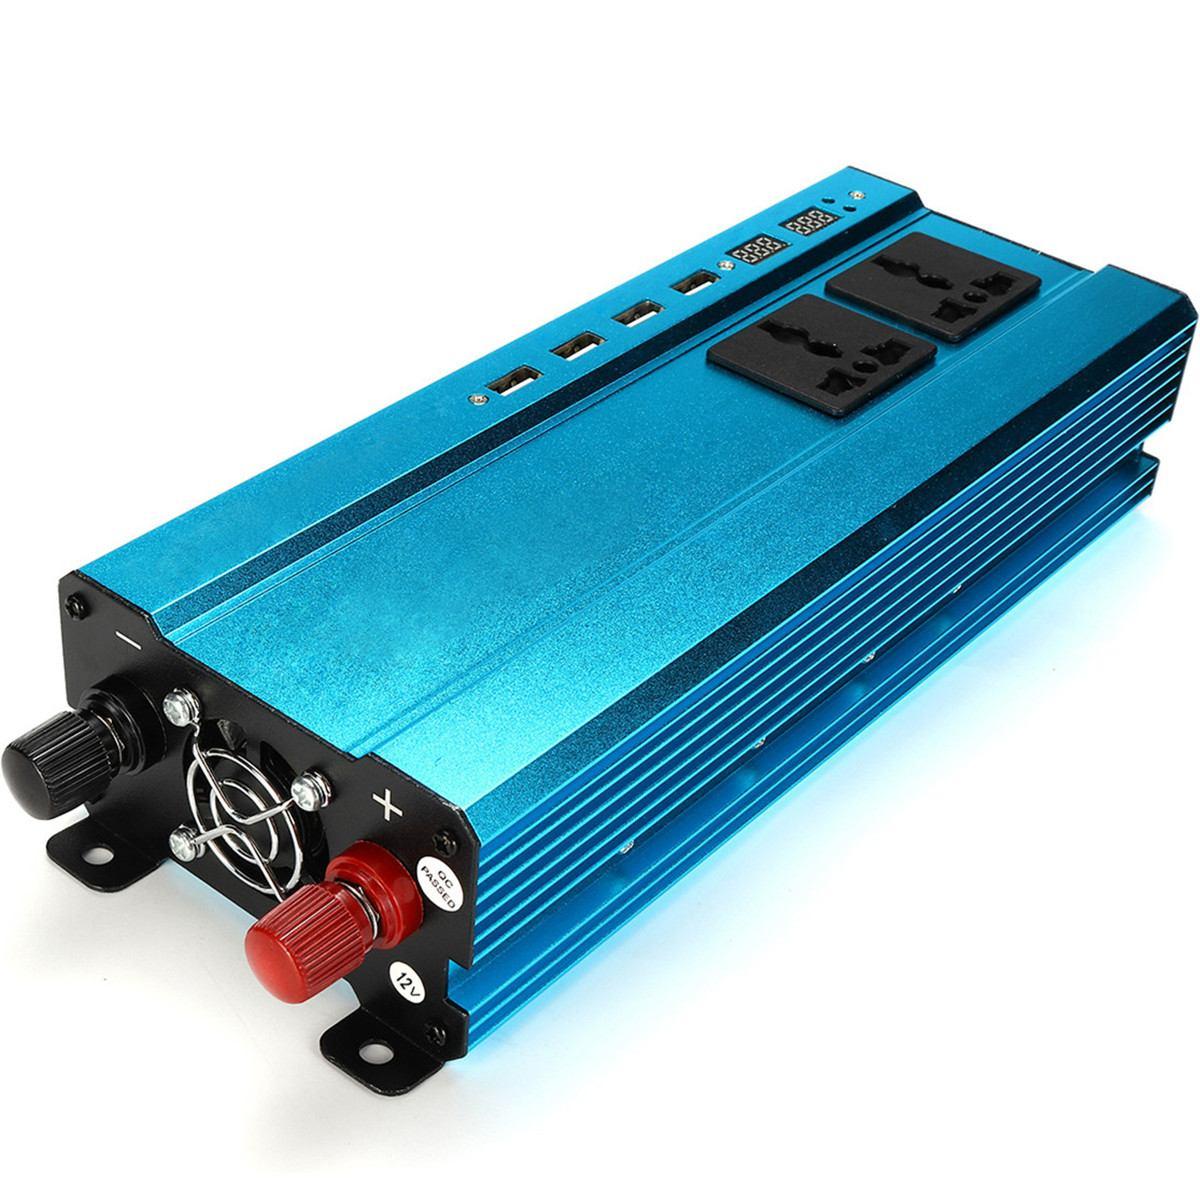 2500W Inverter DC 12V/24V to AC 220V Modified Sine Wave Portable Car Power Inverter Converter Adapter 4 USB 2 LED Display